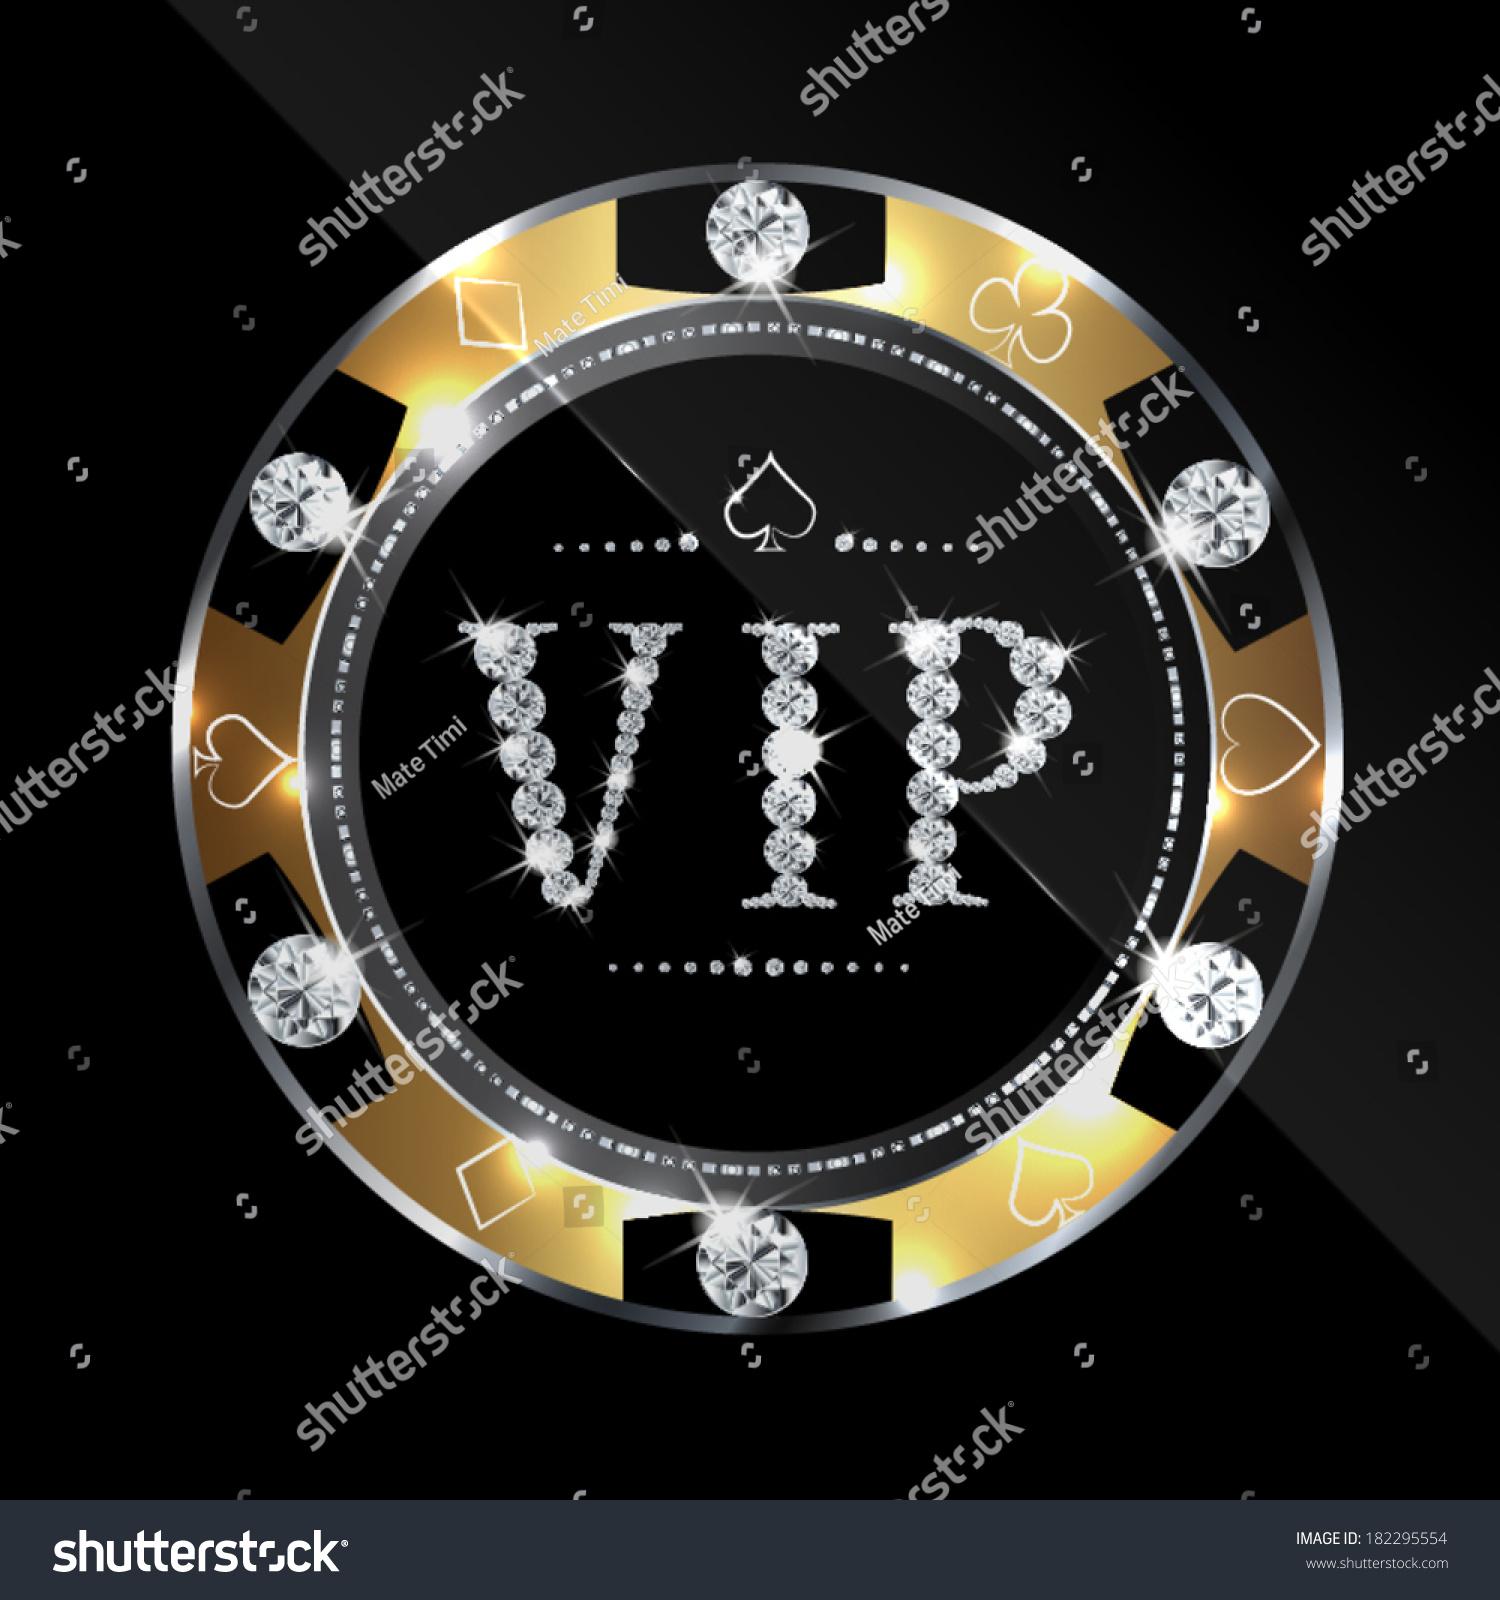 Gold vip club casino free download